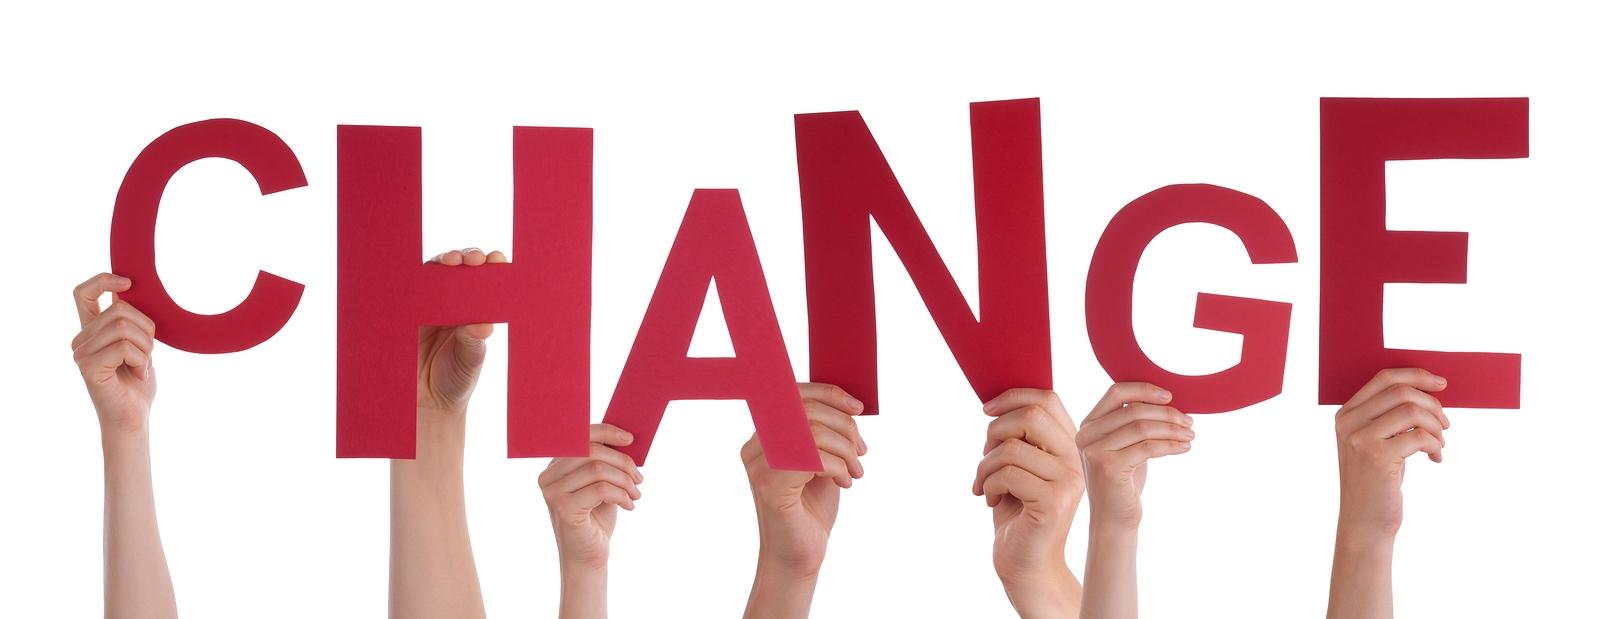 bigstock-Hands-Holding-Change-49582292